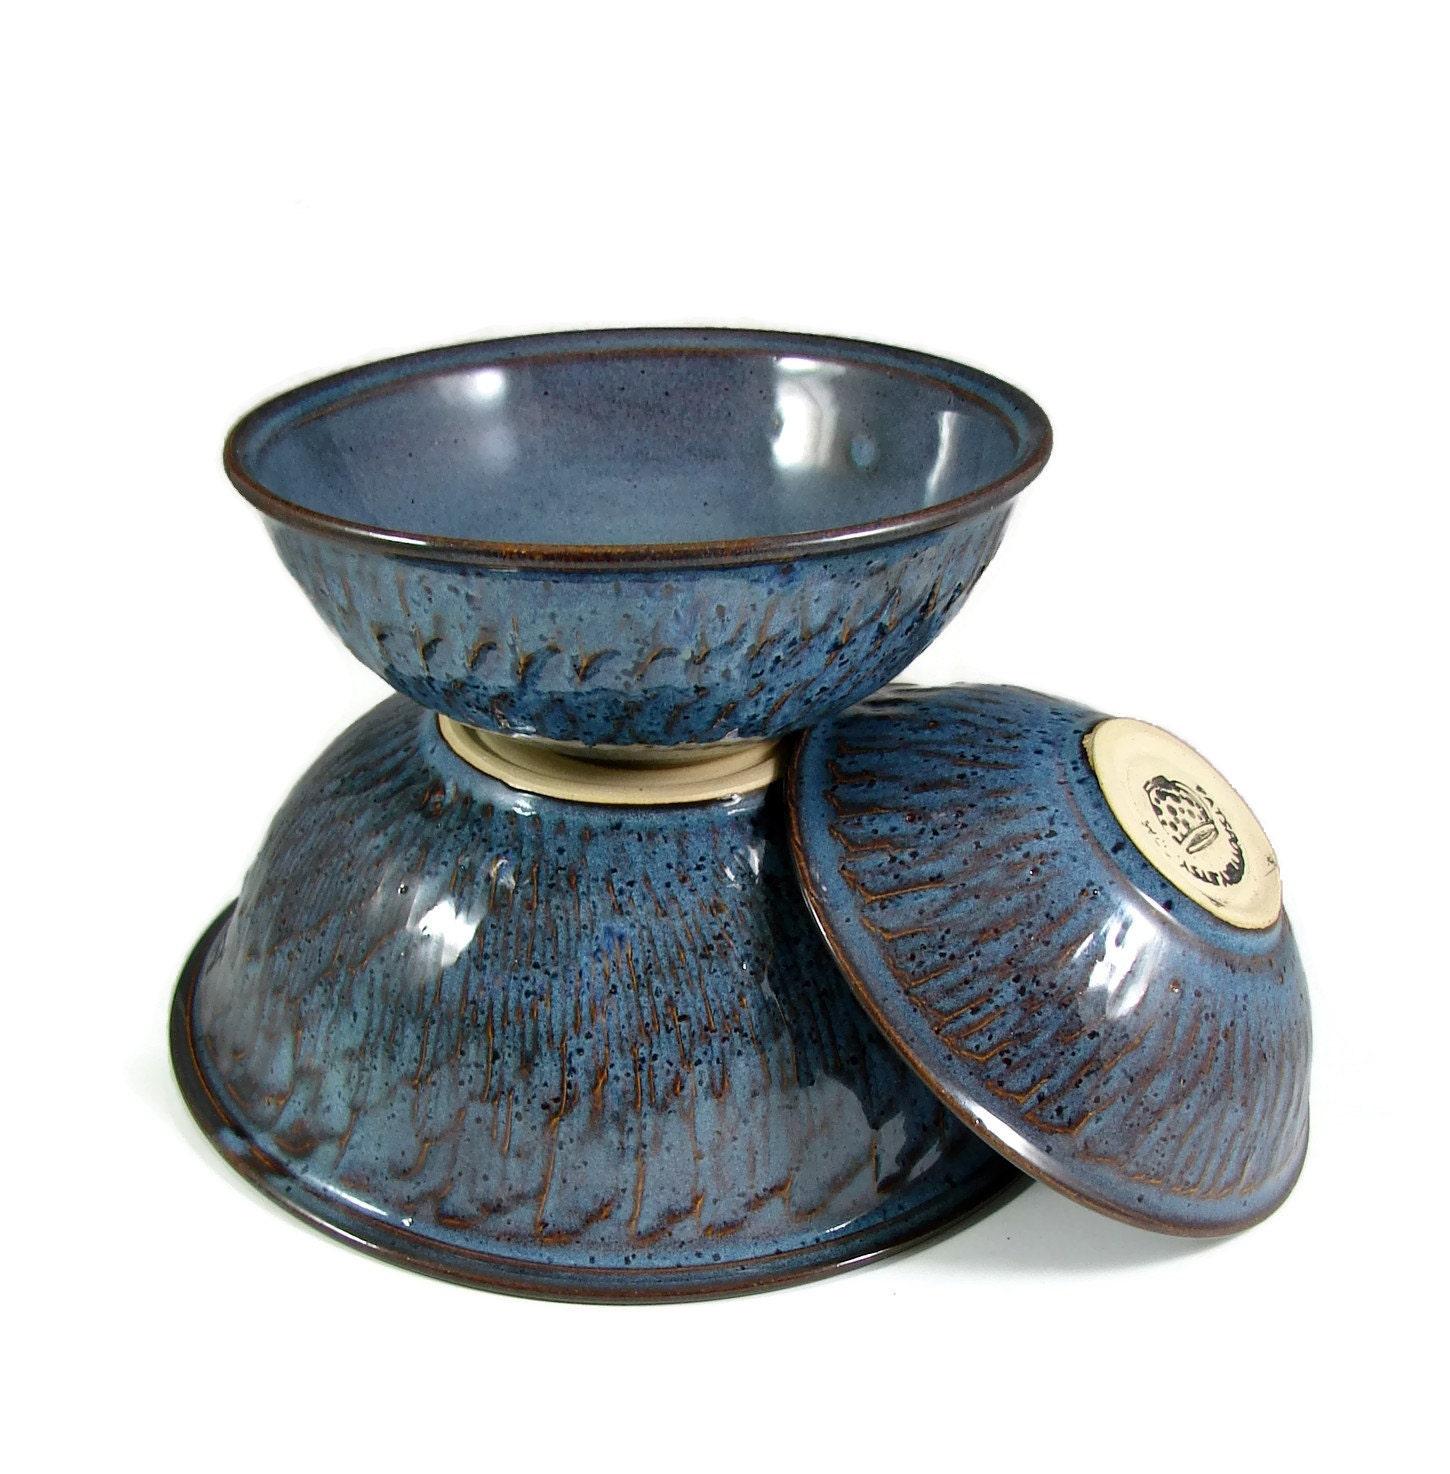 verschachtelung von keramik sch ssel set keramik schalen. Black Bedroom Furniture Sets. Home Design Ideas